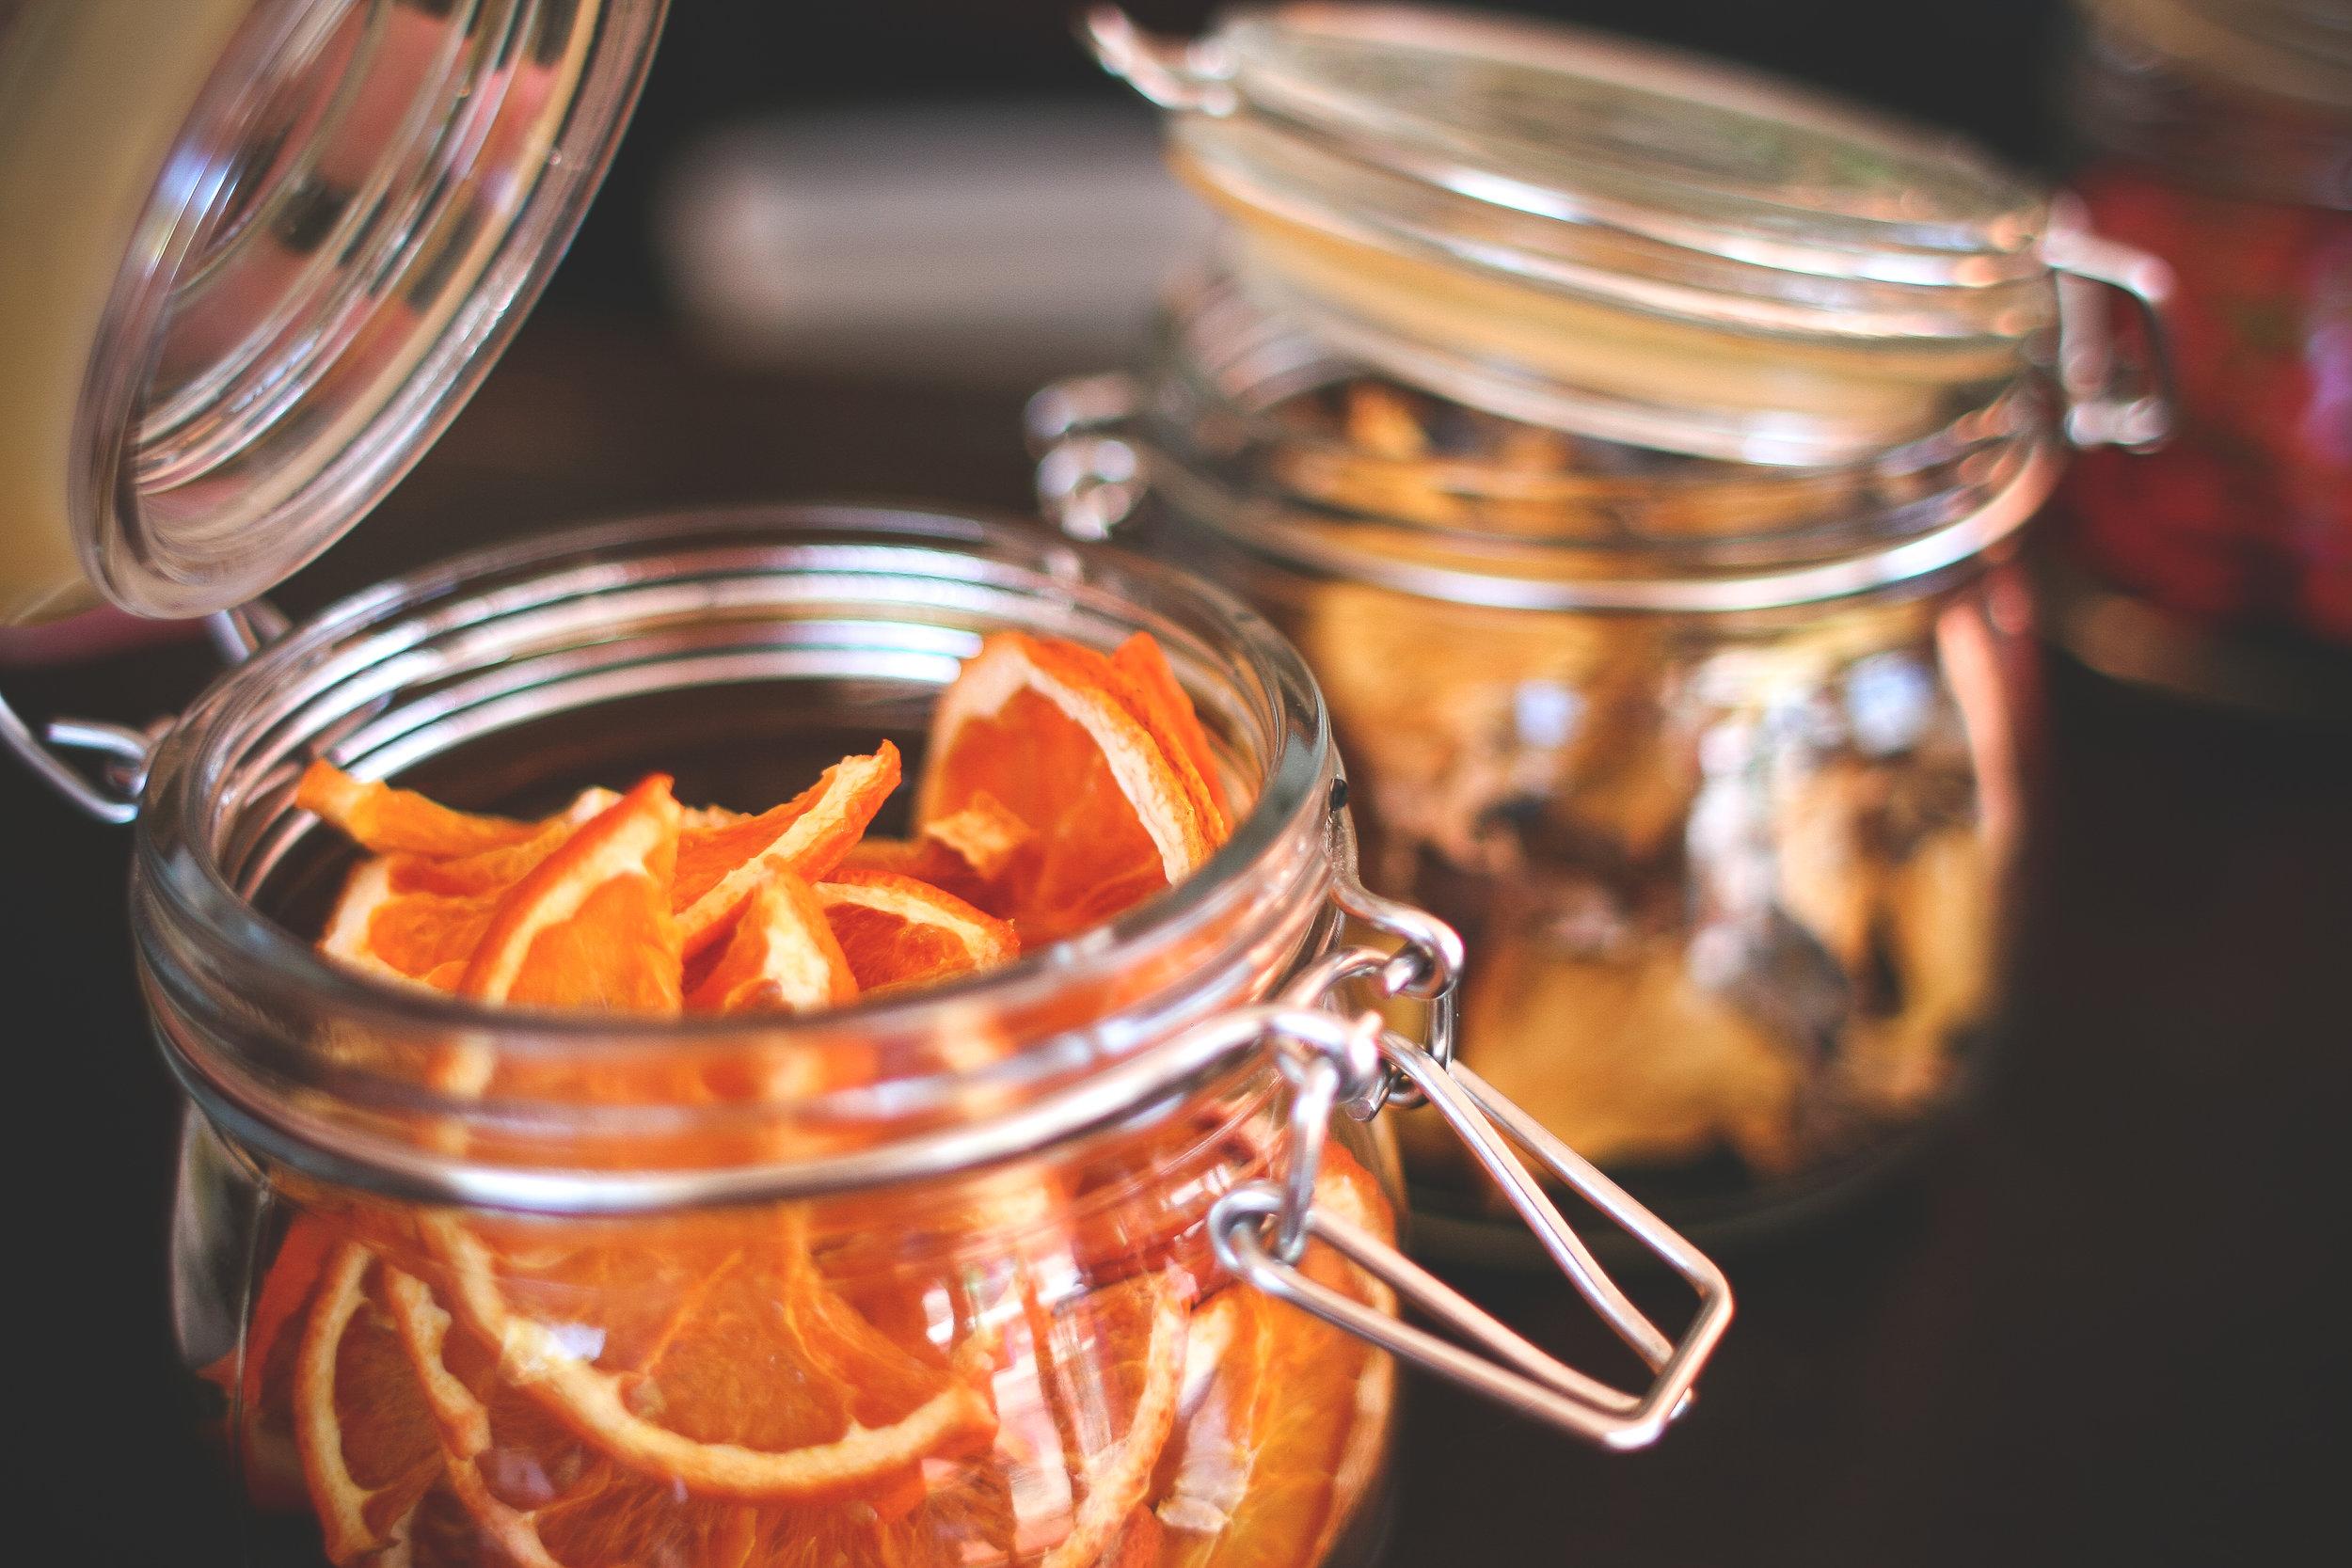 dried-oranges-in-an-old-jar-picjumbo-com.jpg